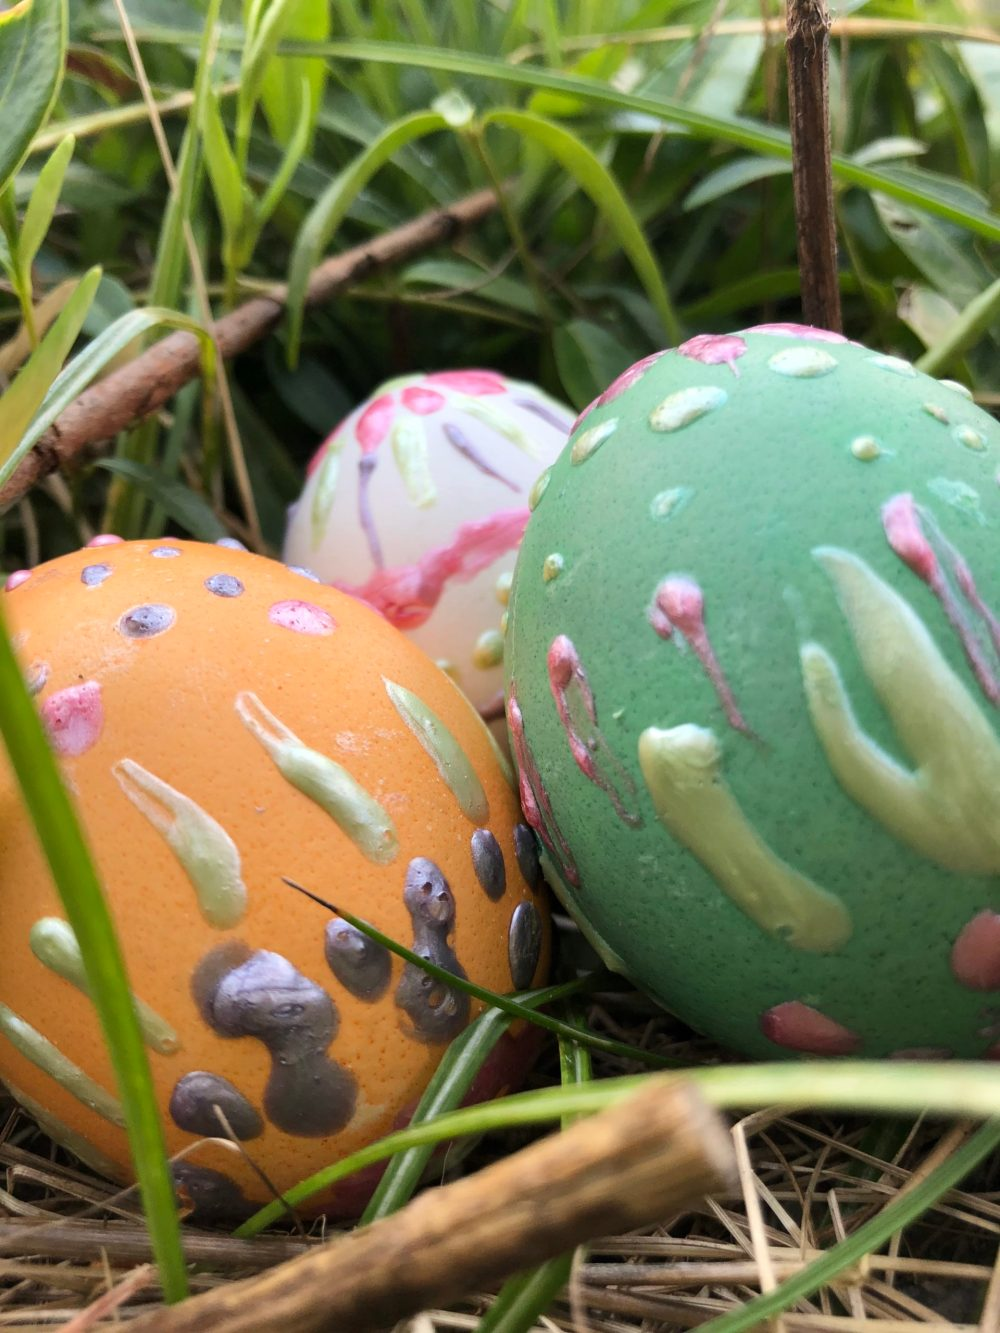 Drei bemalte Eier durch die Nahaufnahme fotografiert